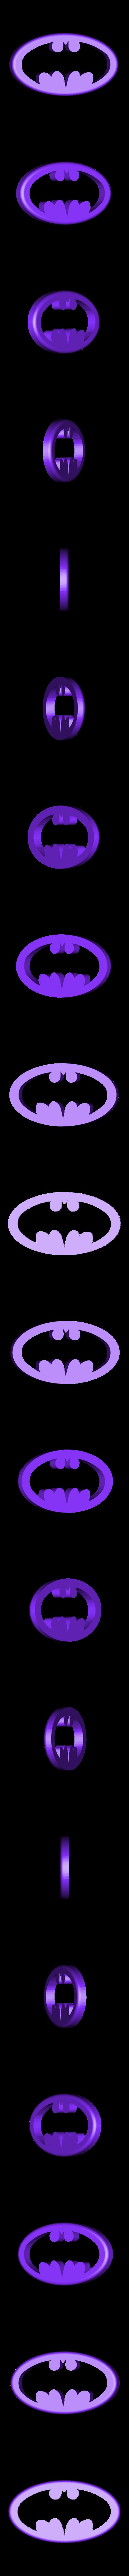 BatMan.STL Download free STL file BATMAN LED Light/Nightlight • 3D print design, Balkhagal4D